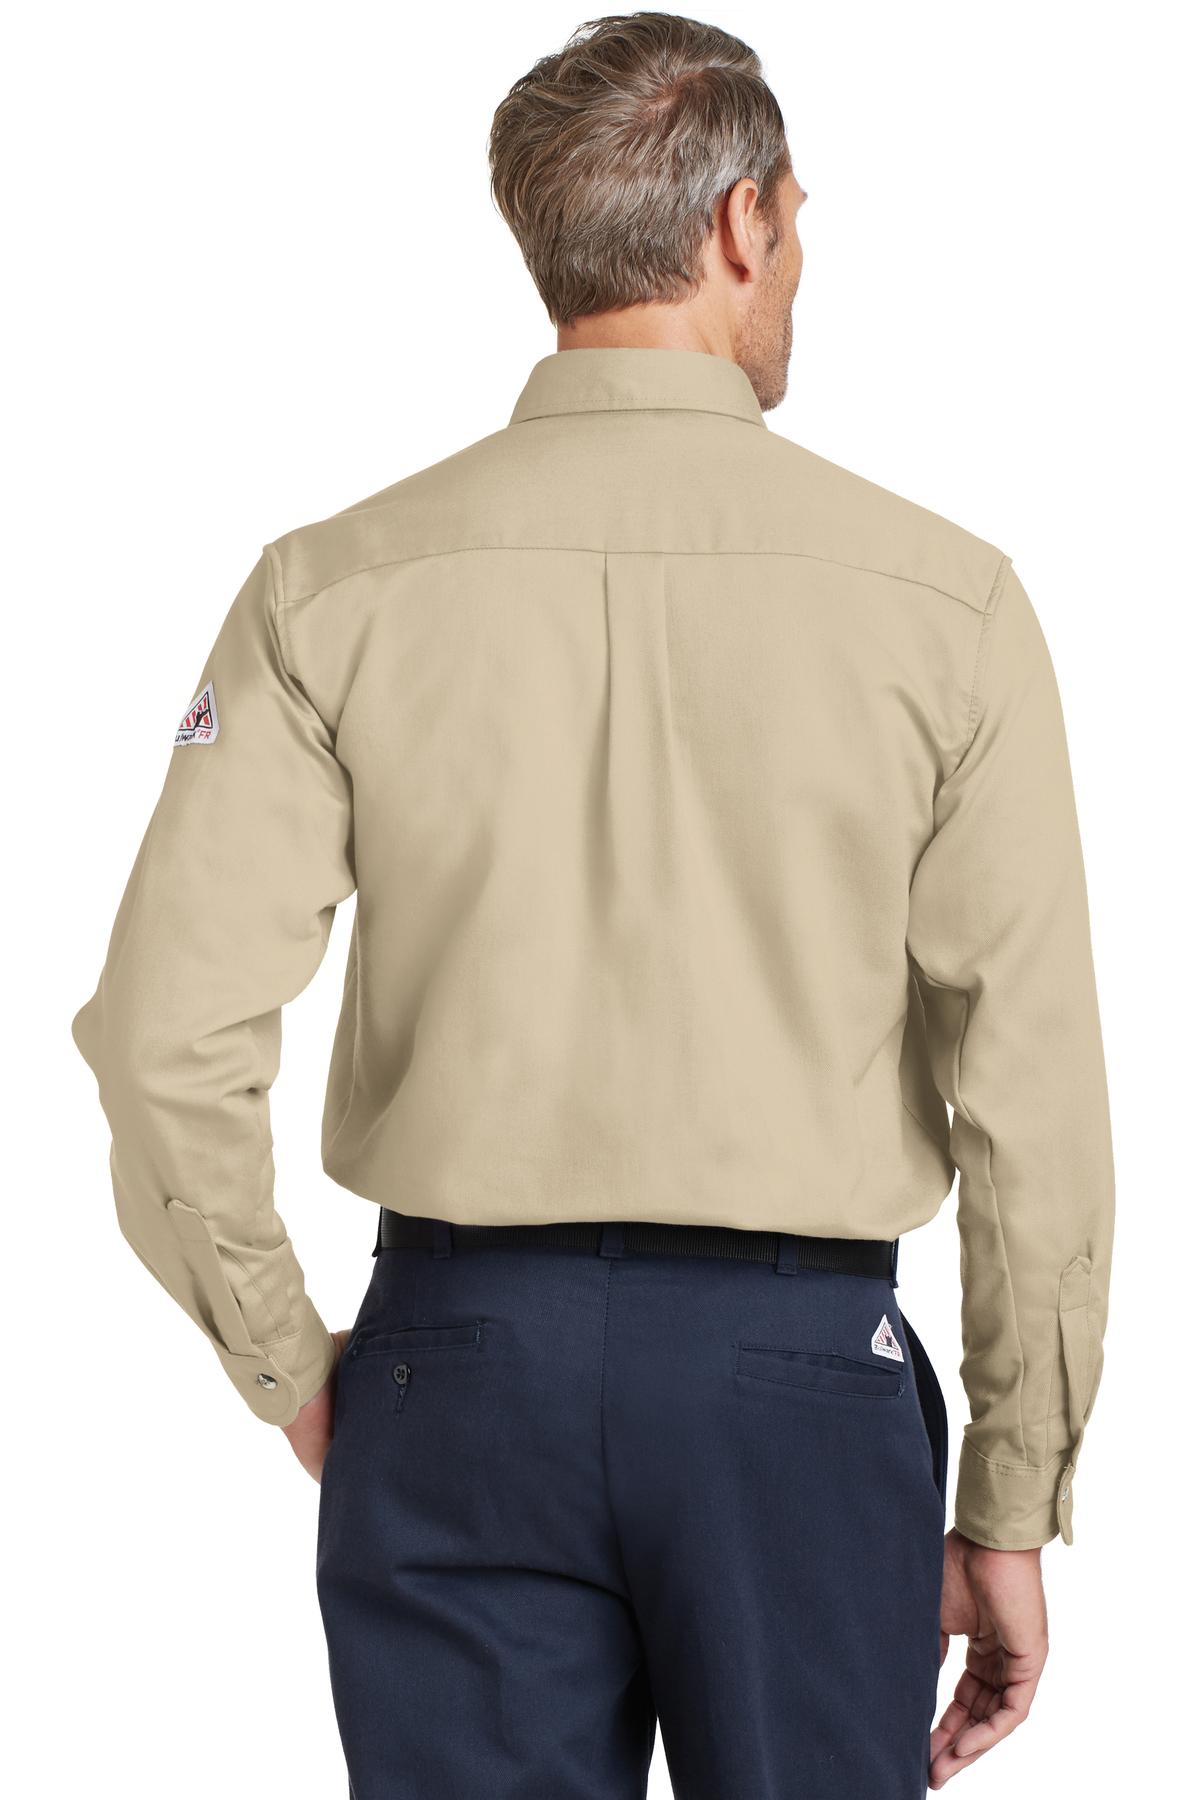 Bulwark Excel Fr Comfortouch Dress Uniform Shirt Industrial